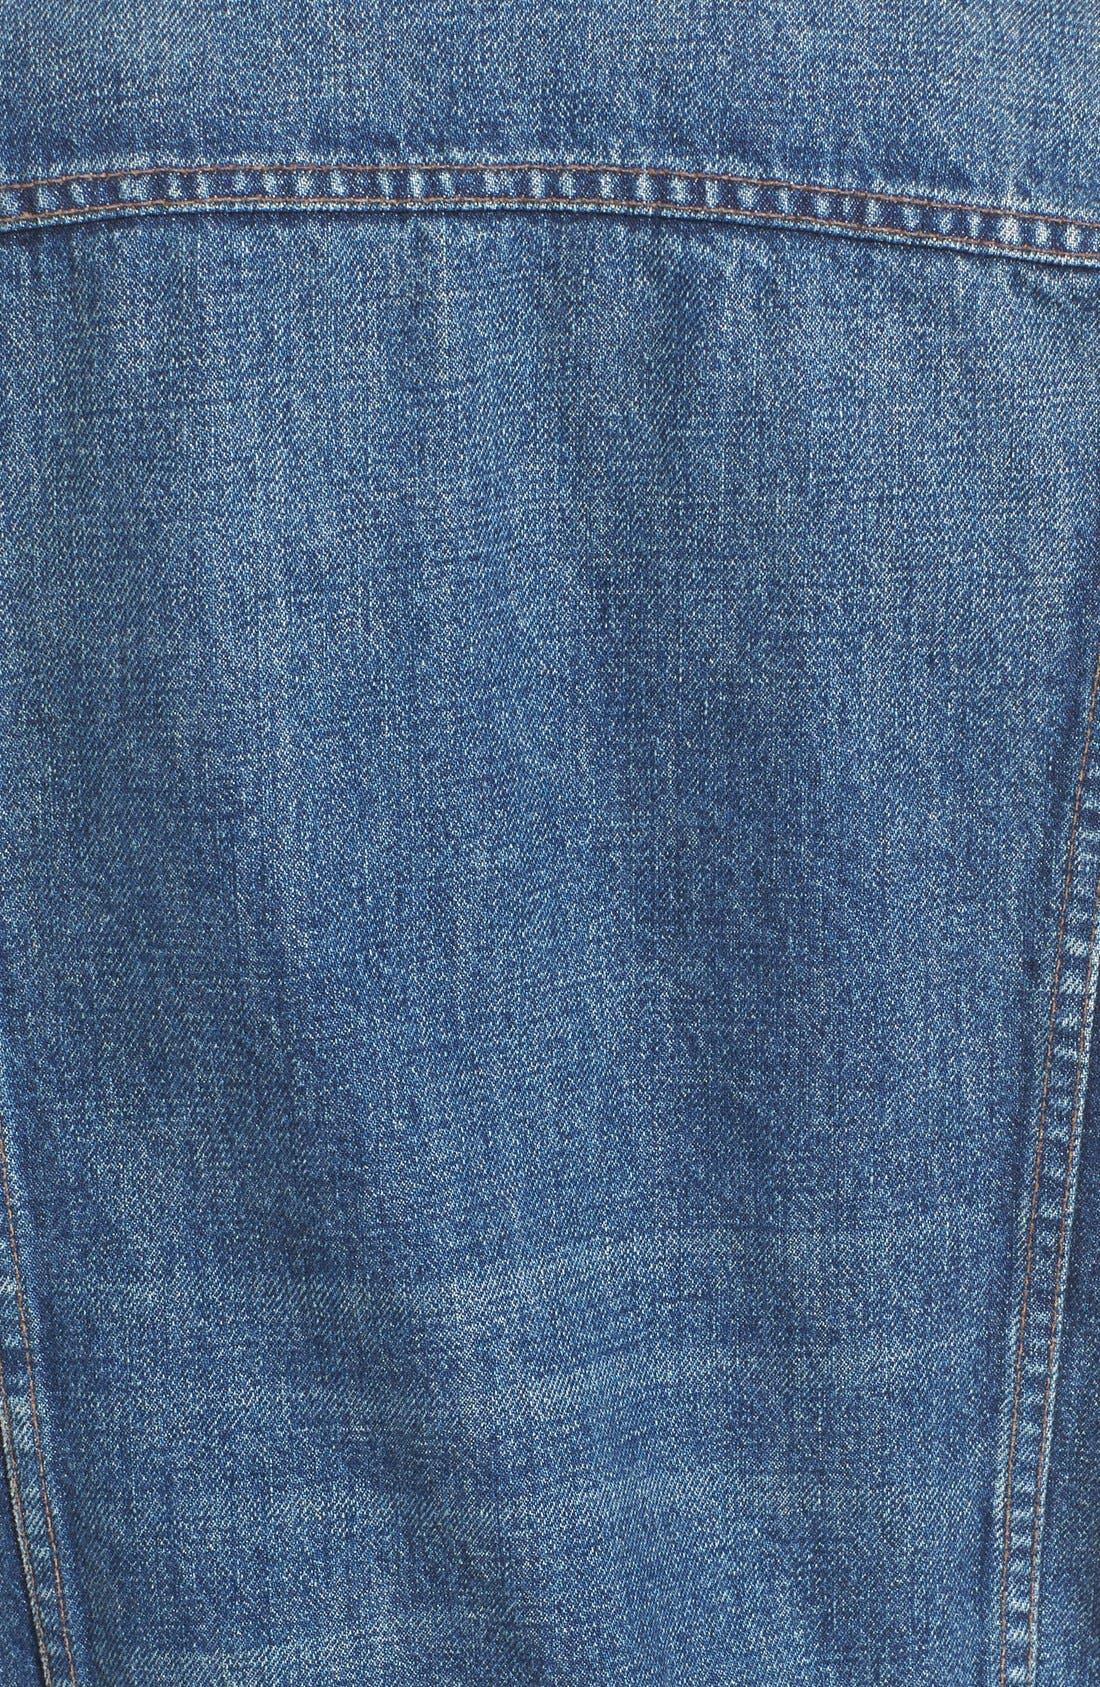 HELMUT LANG,                             Denim Trench Coat,                             Alternate thumbnail 4, color,                             422